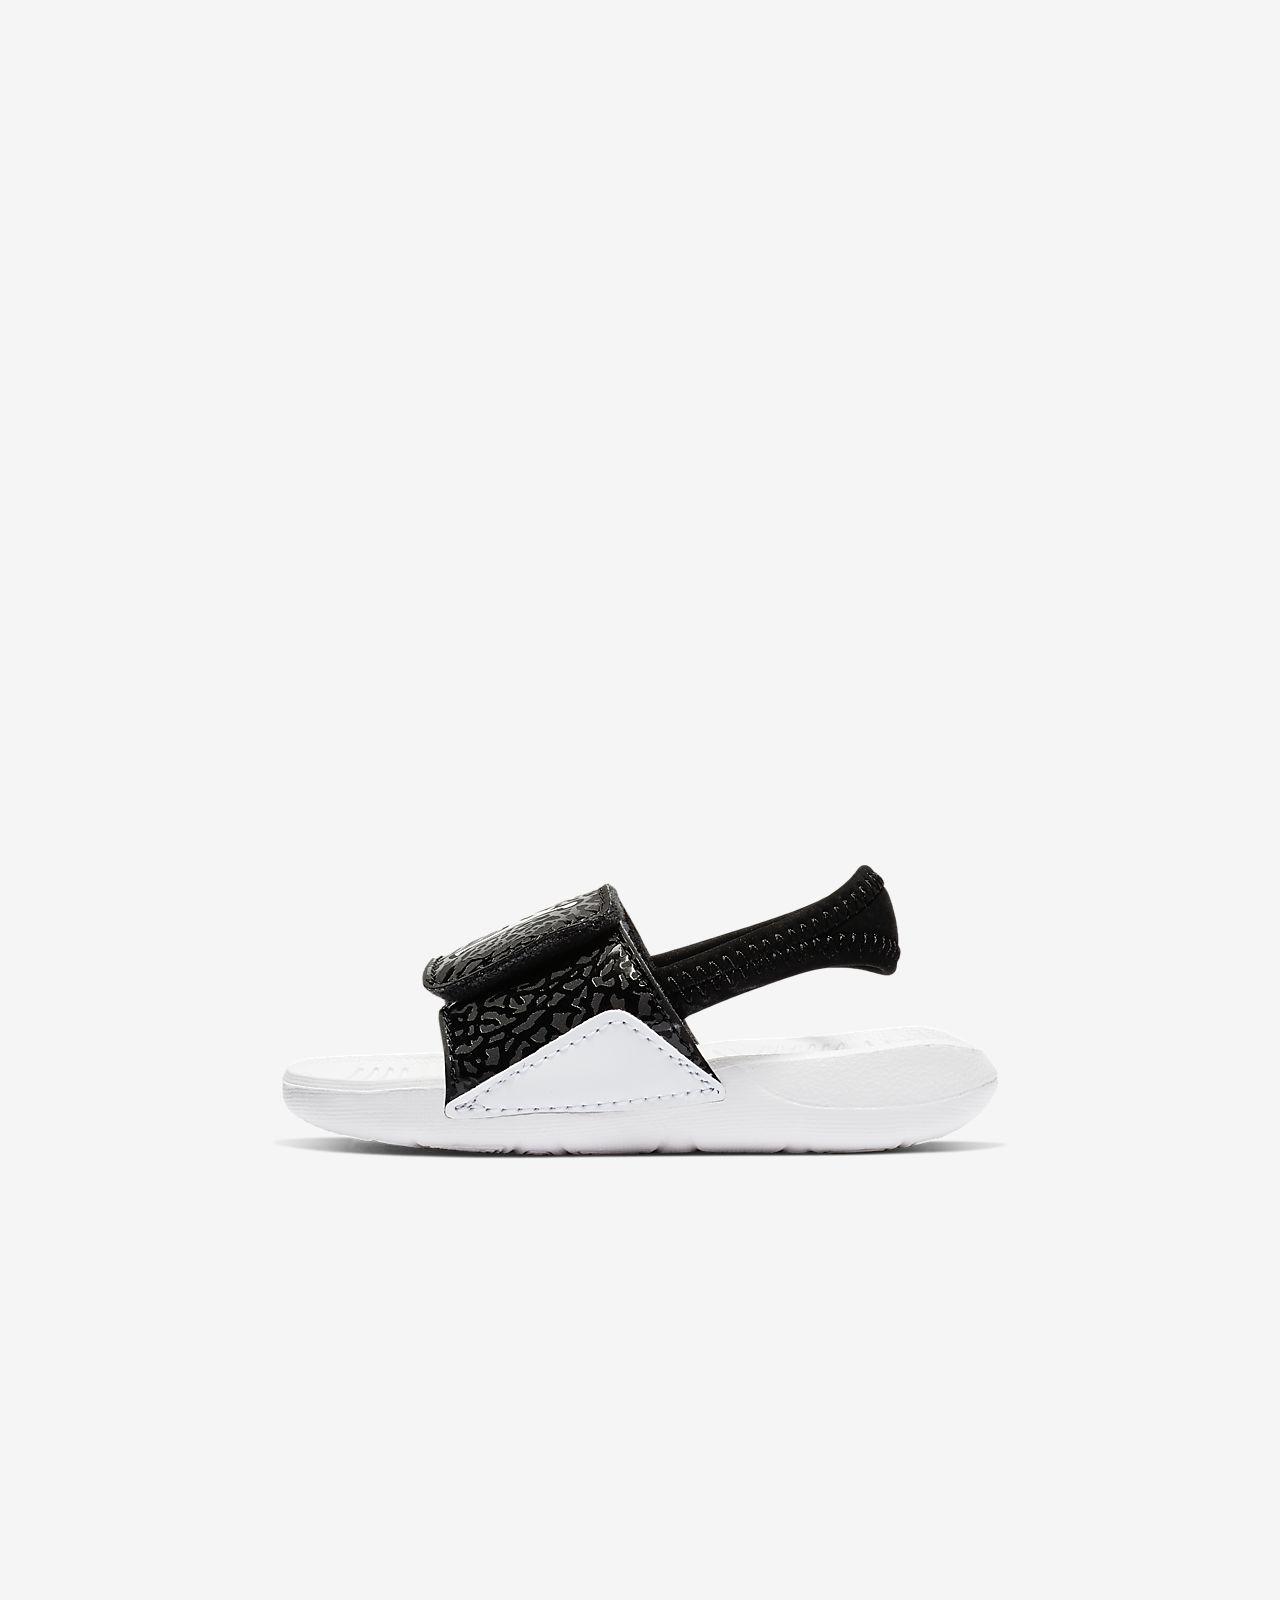 6c23a66013bf Jordan Hydro 7 V2 Toddler Slide. Nike.com